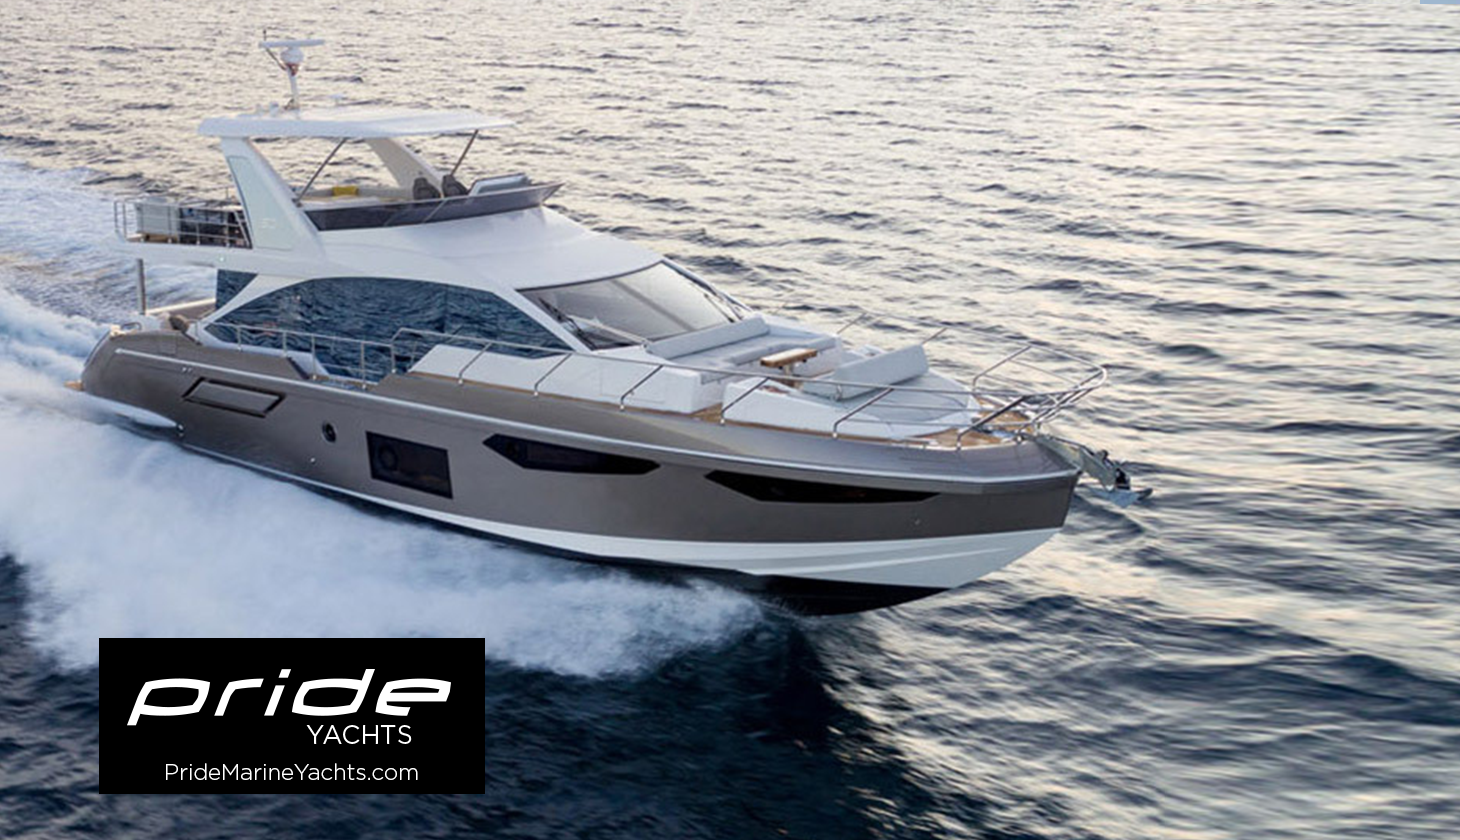 Yacht Sales In Ontario Pride Marine Yachts